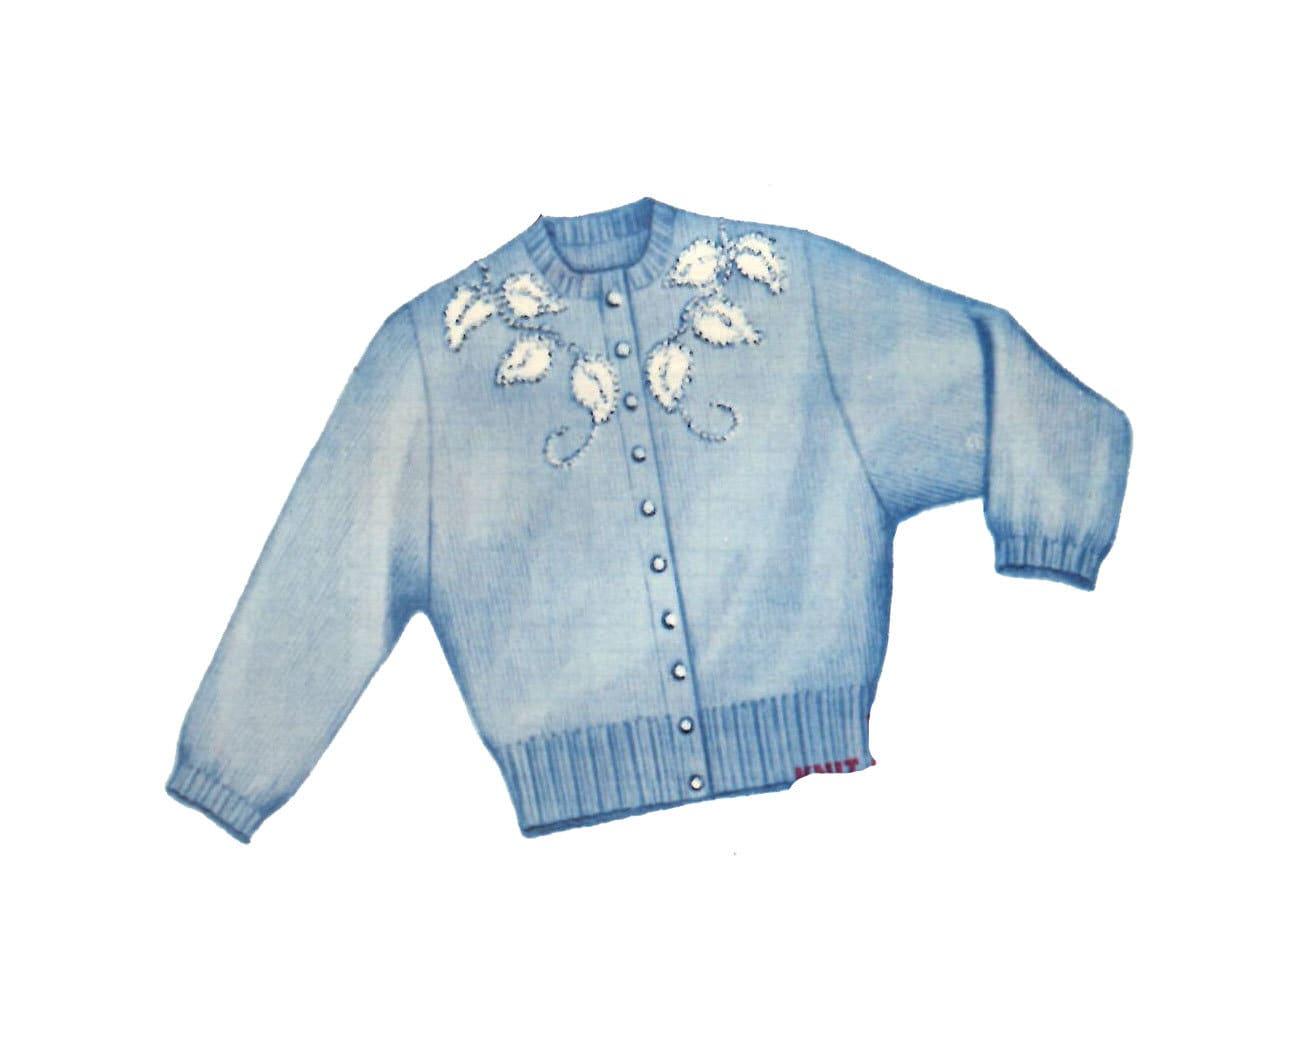 Ladies Sweater PATTERN Plaid front Leaf yoke Knit O Graf 217